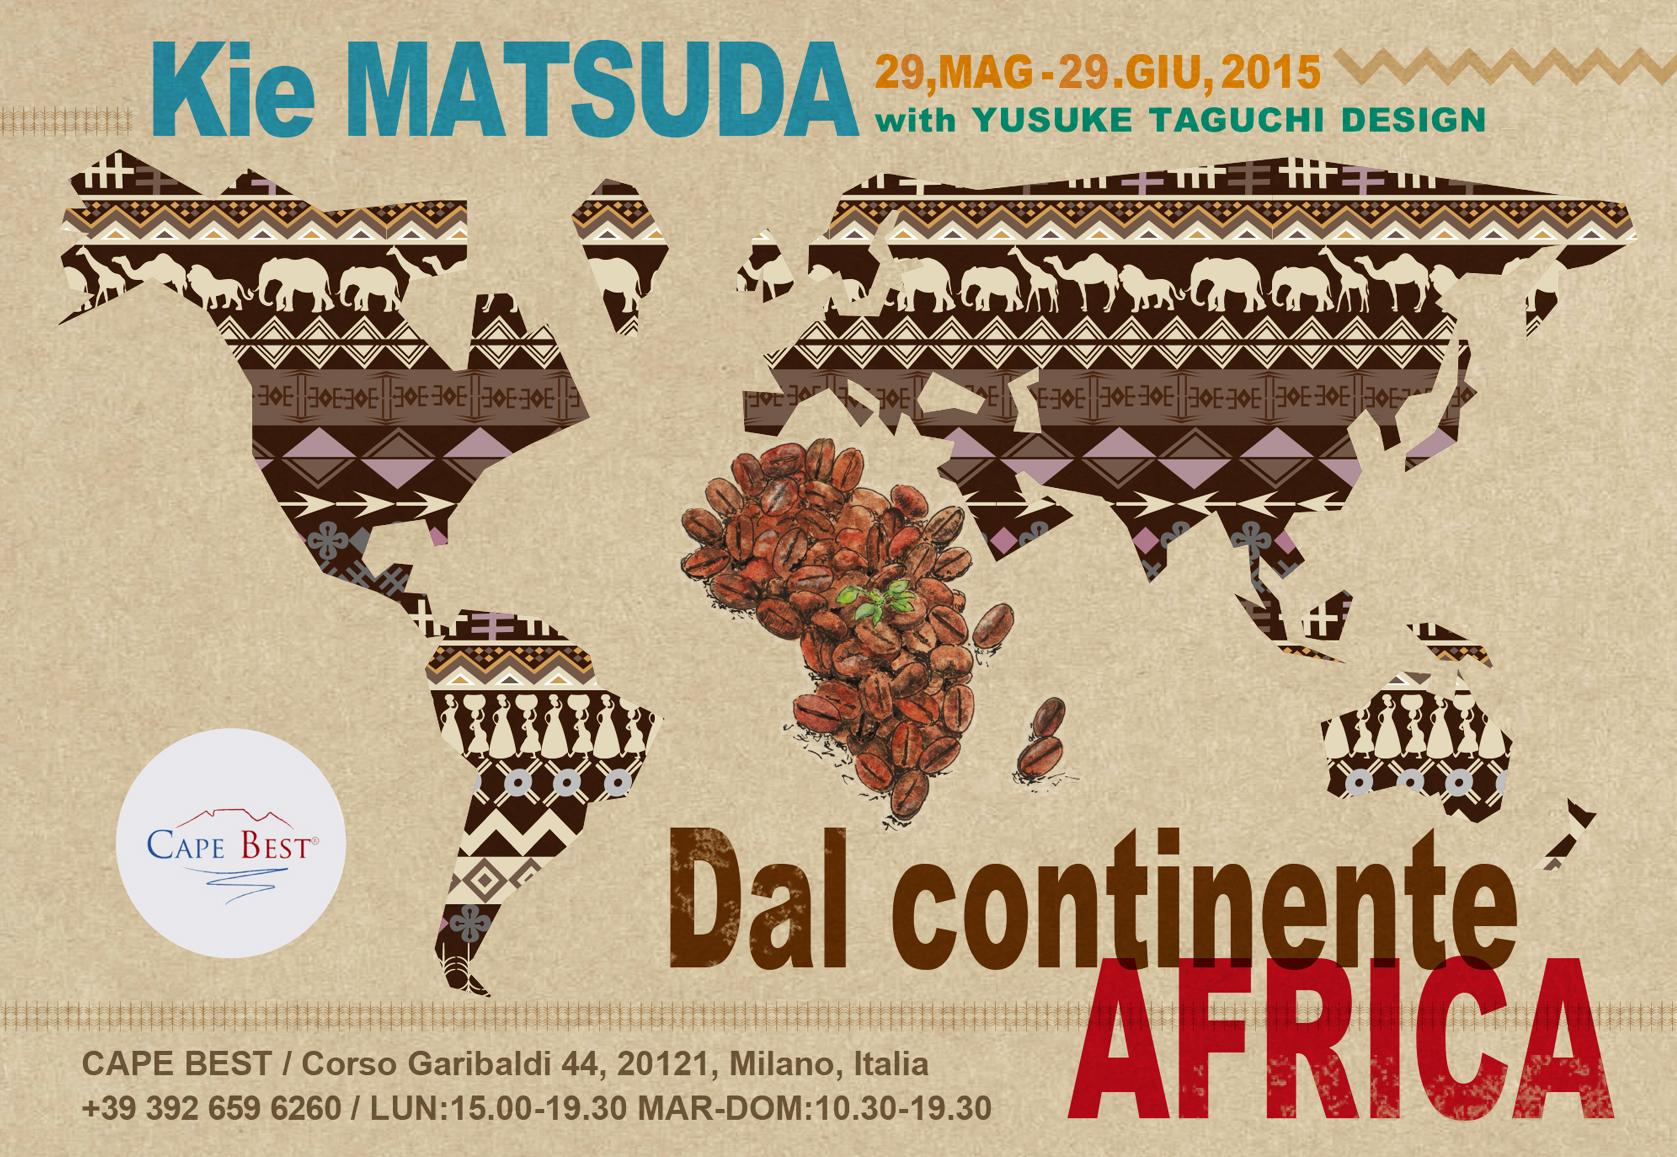 2015-5 Milano-Dal continente Africa-DM